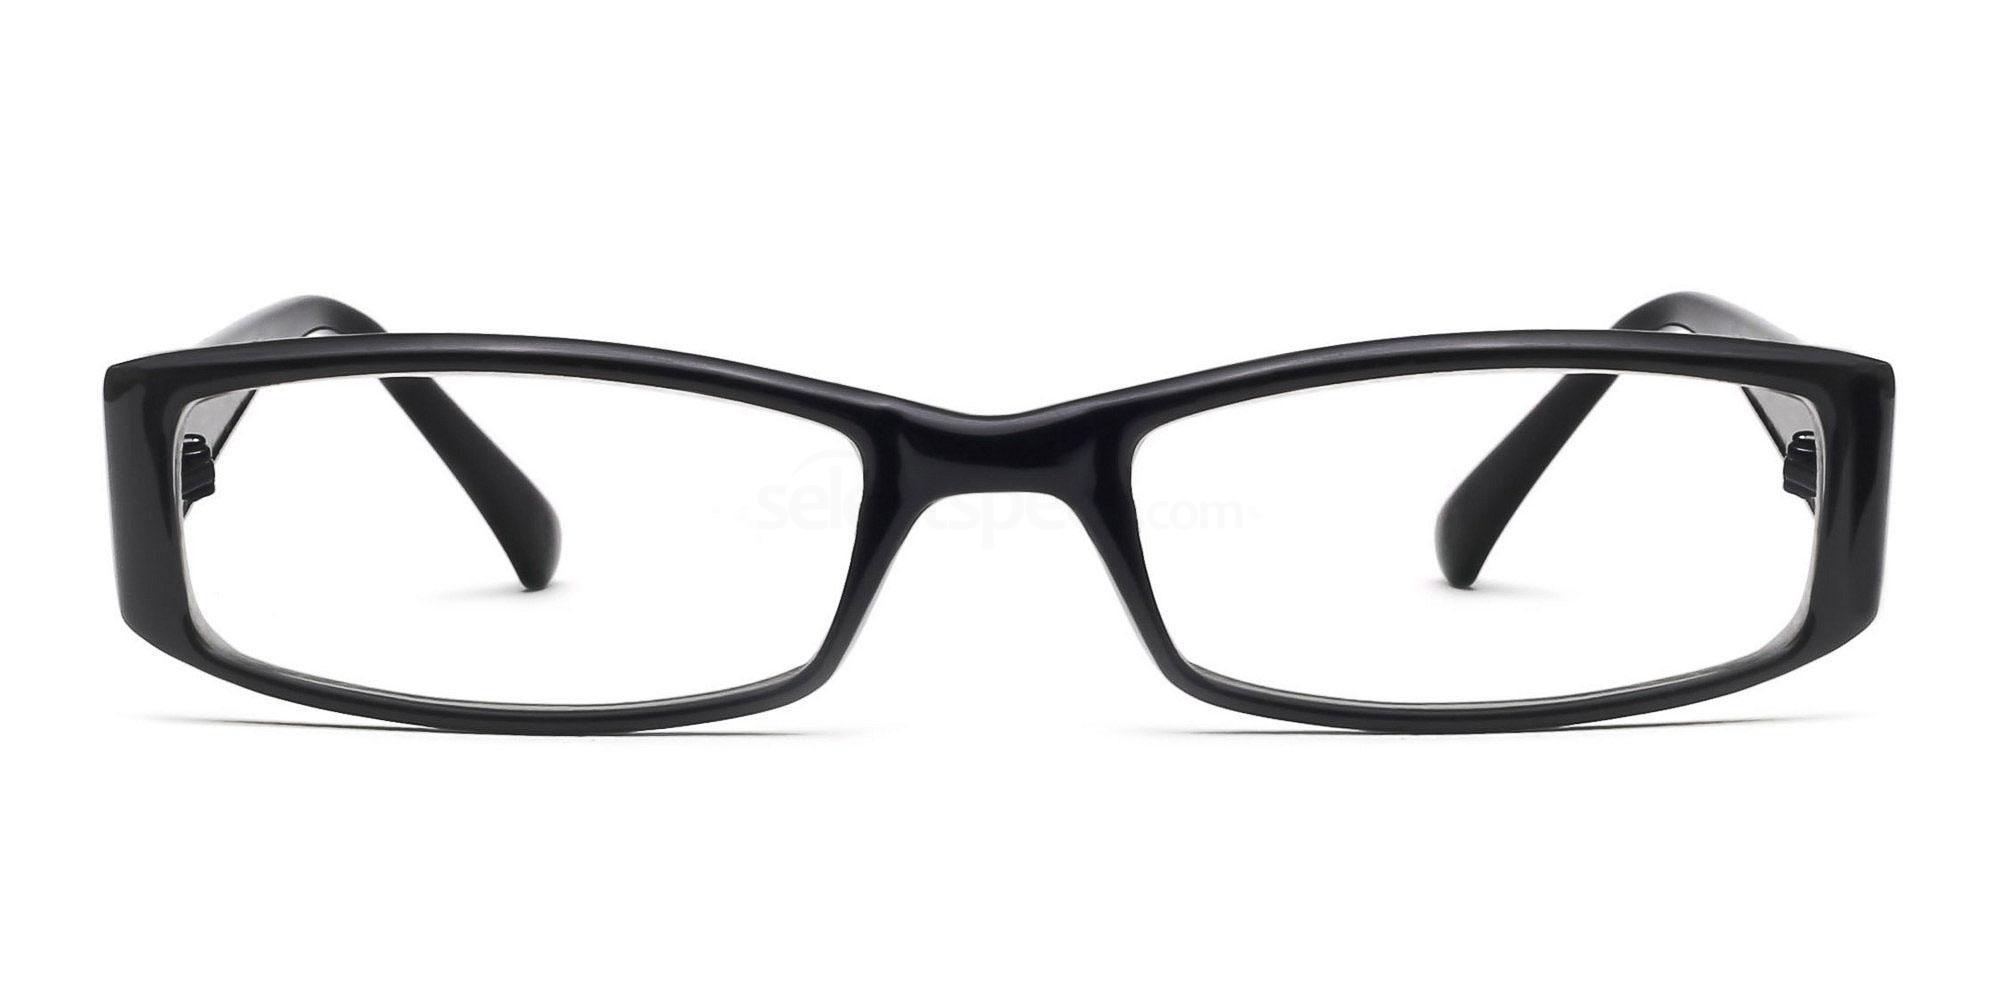 C1 P2251 - Black Glasses, SelectSpecs